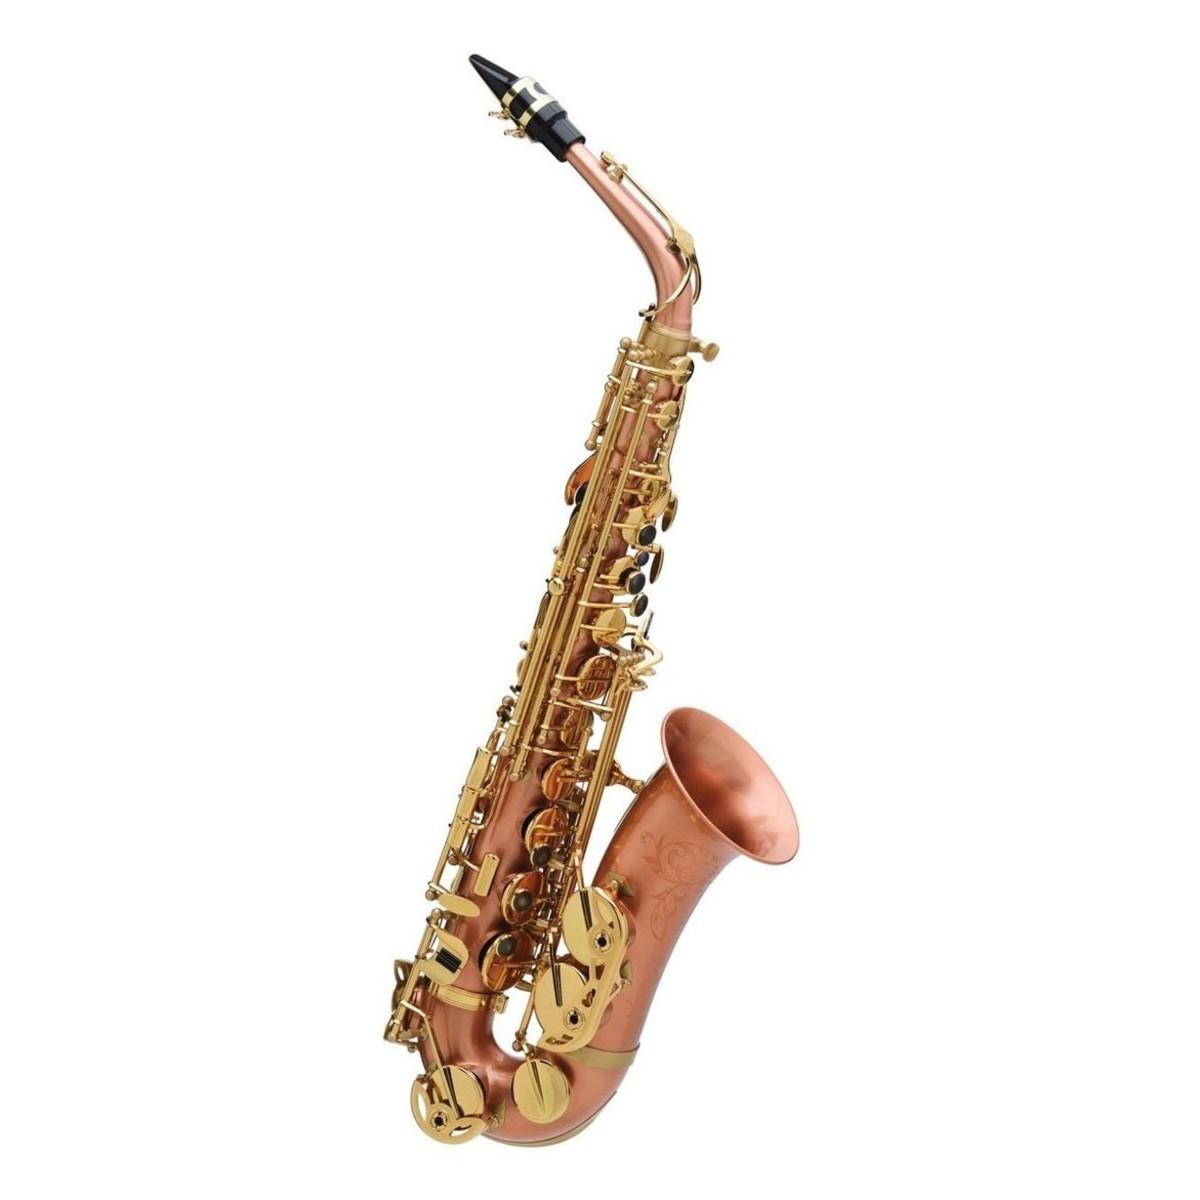 buffet senzo alto saxophone with brushed copper body brass keys rh gear4music de buffet alto saxophone 400 buffet alto saxophone 400 series